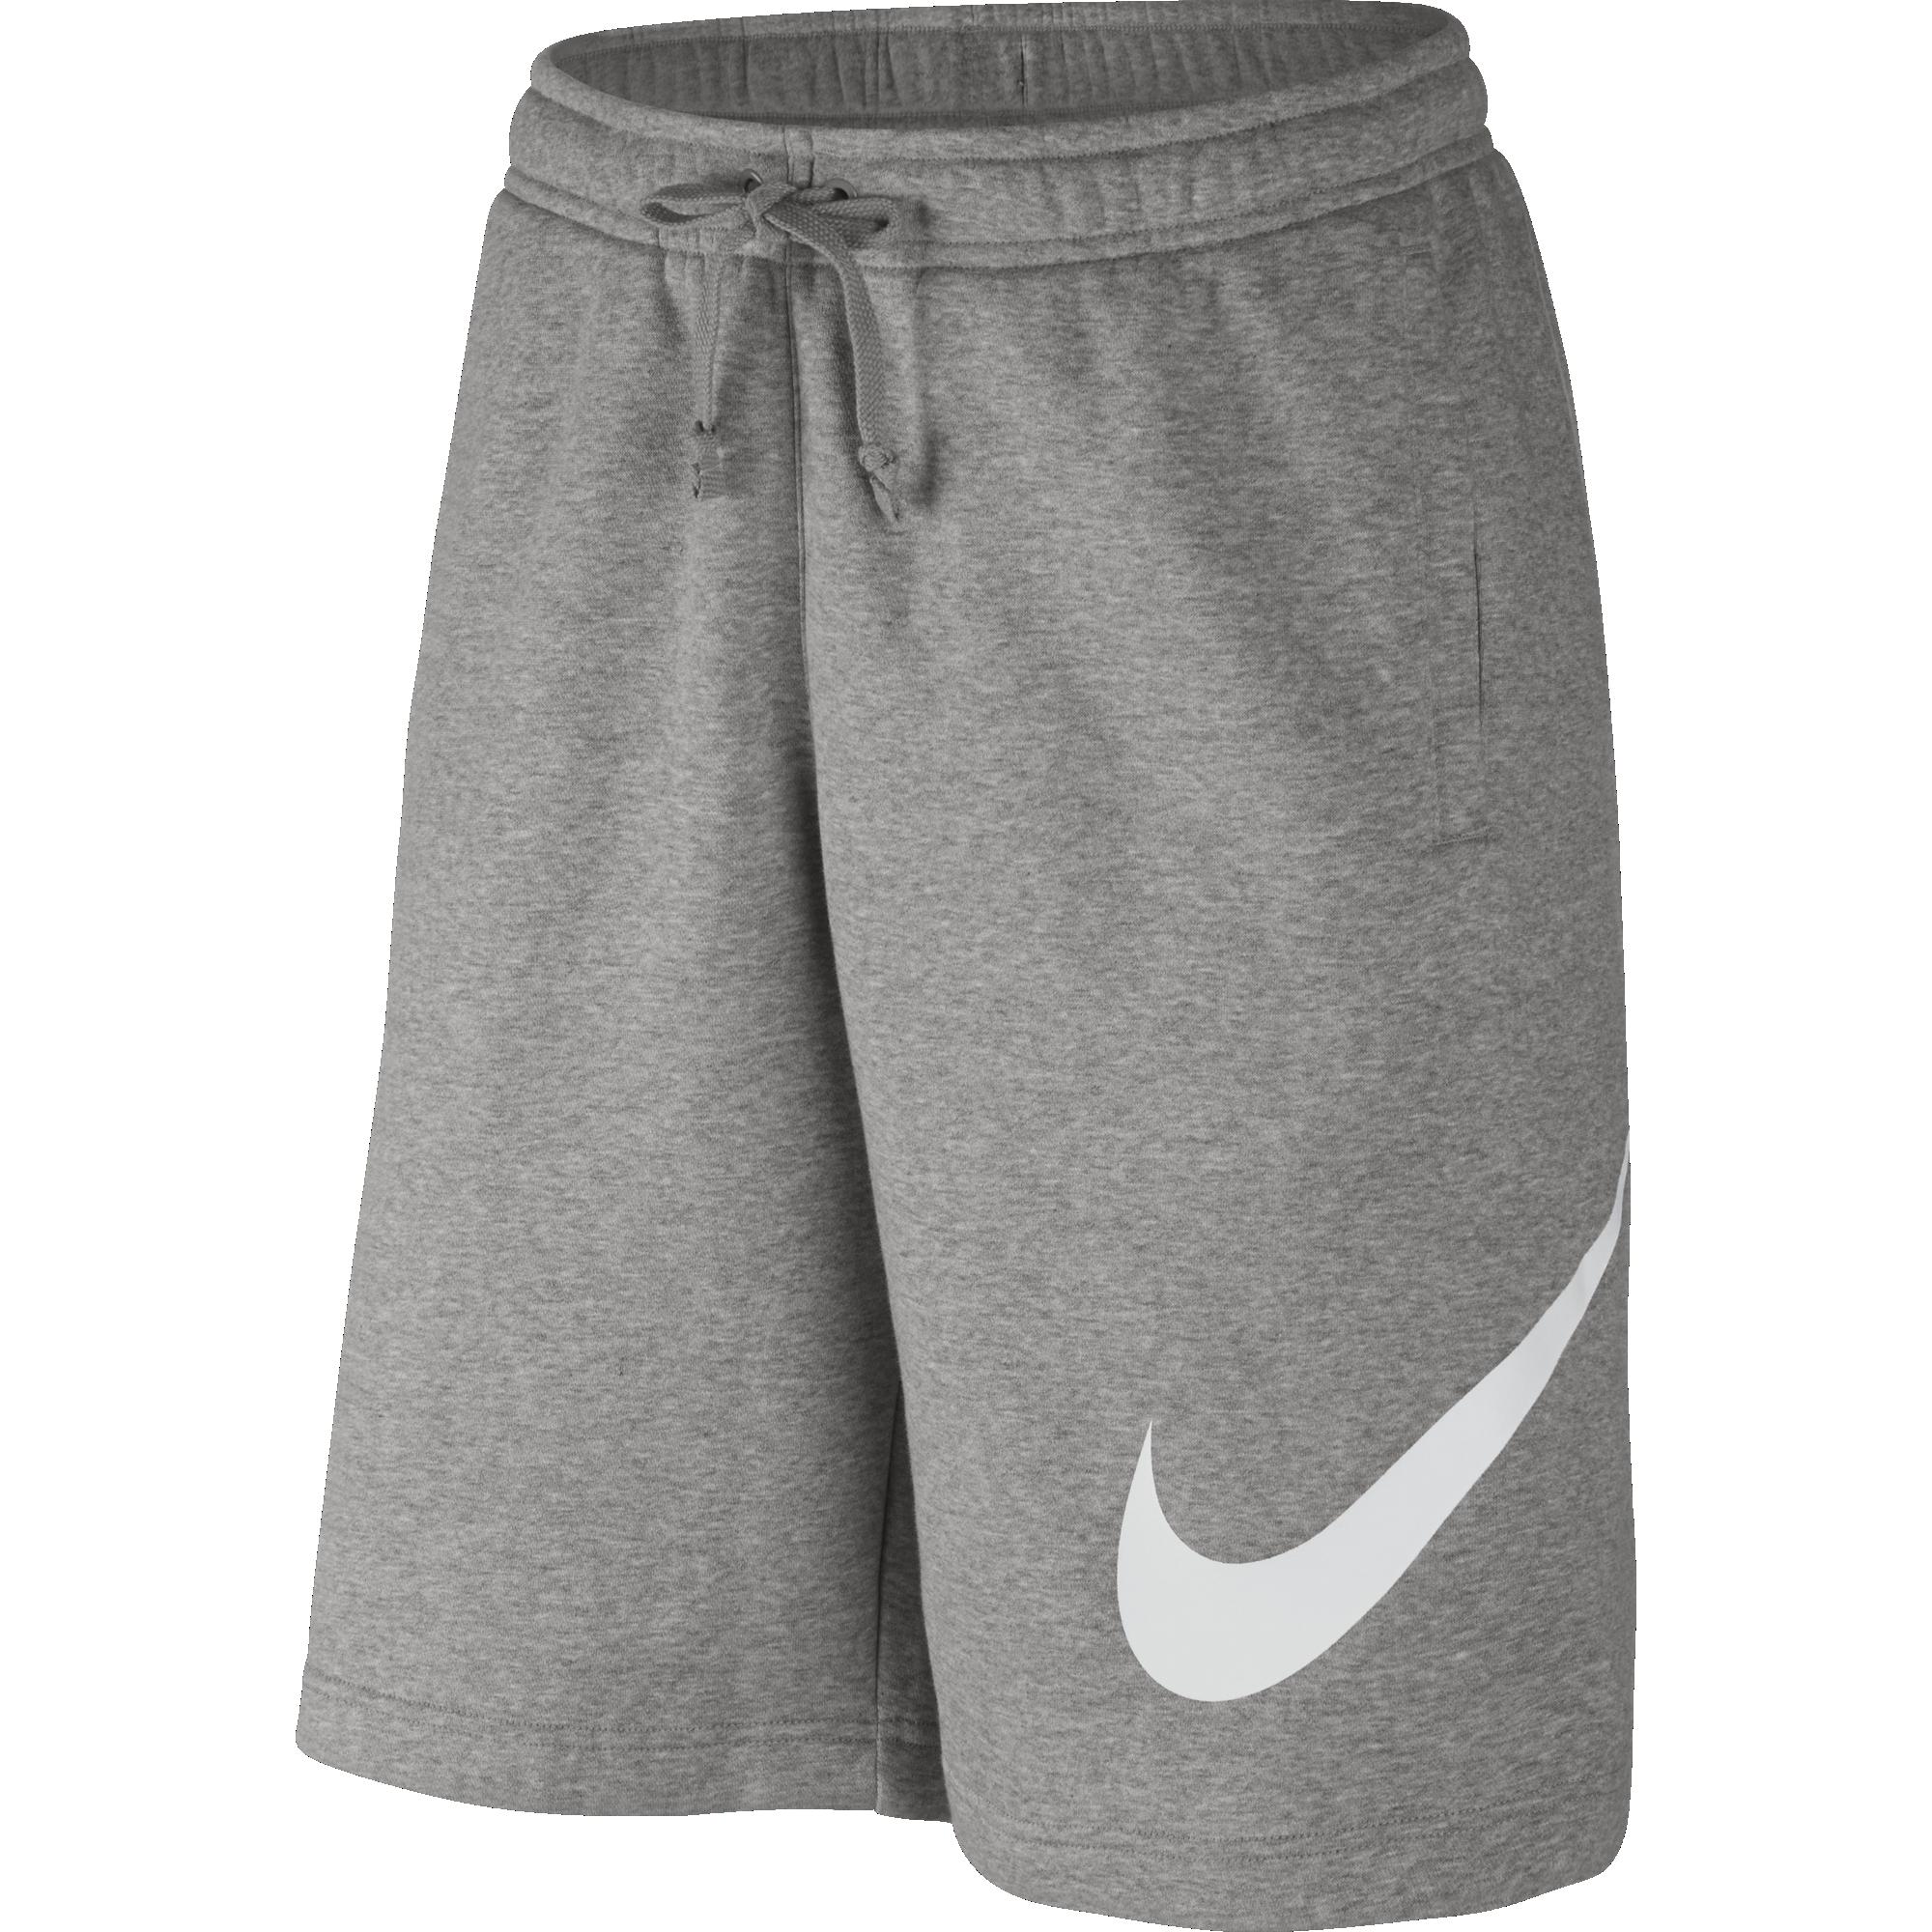 5ece00d32 Nike Club Fleece Shorts - Dark Grey Heather Silver-White